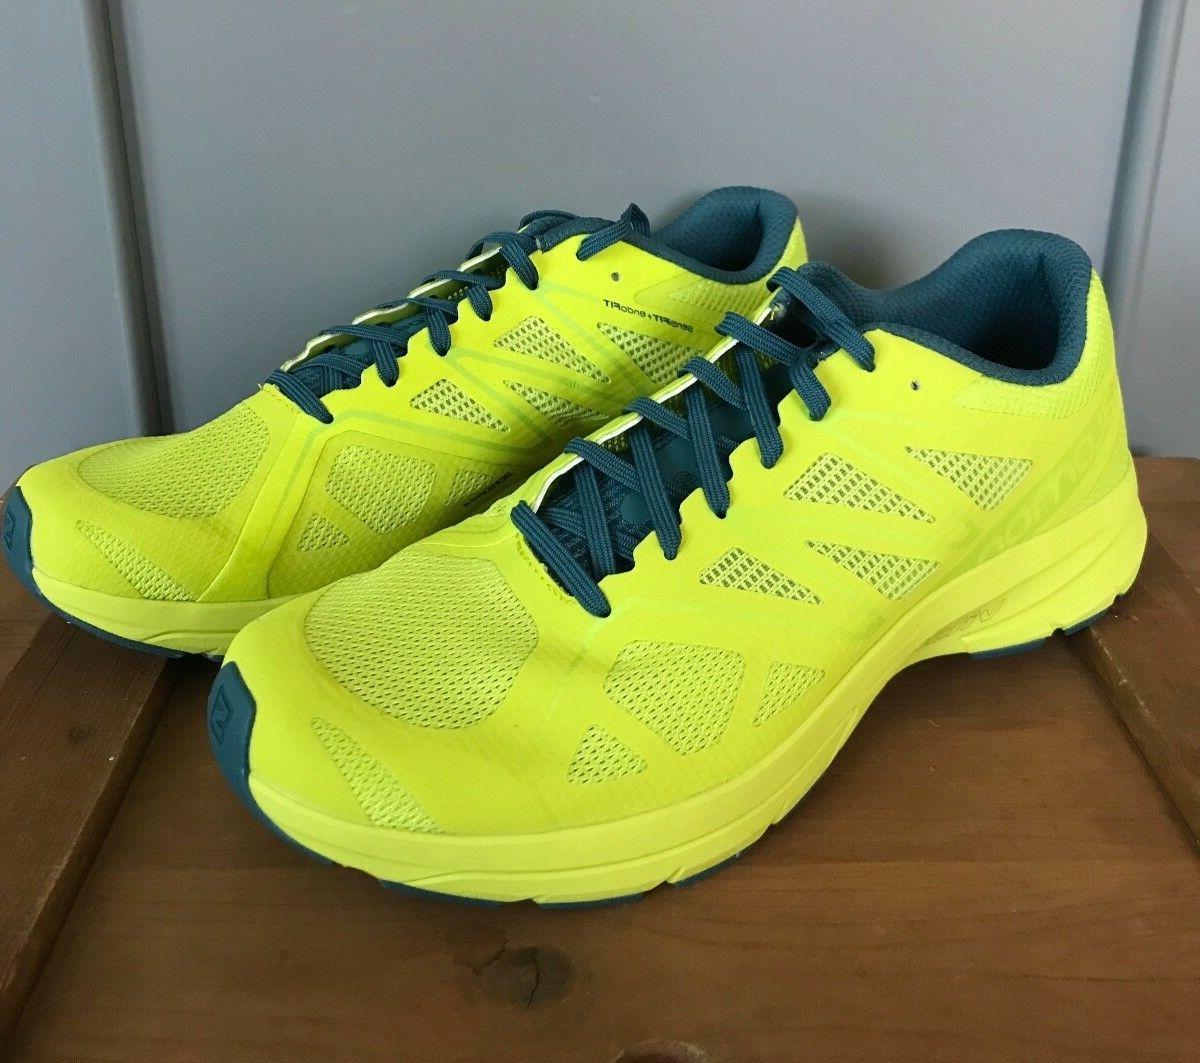 Salomon Sonic Pro 2 Running Shoe, Men's Size 9 #393390